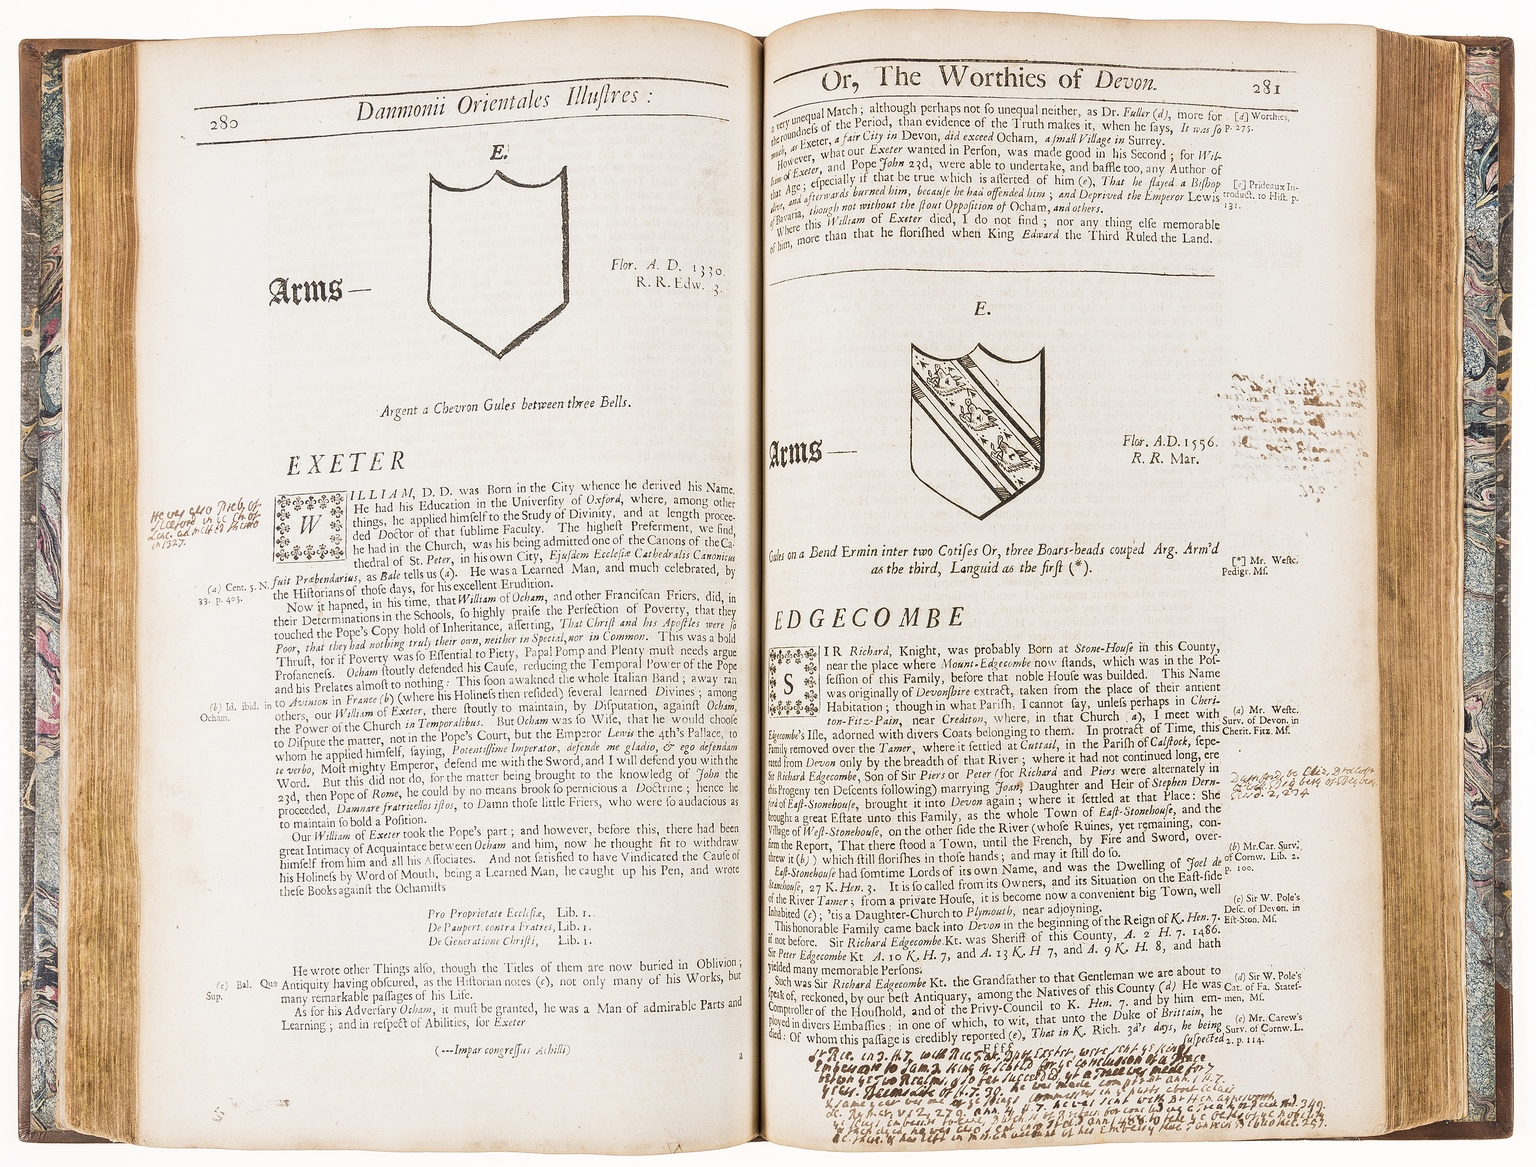 Lot 10 - Devon.- Prince (John) Danmonii Orientales Illustres: or, the Worthies of Devon, first edition, …